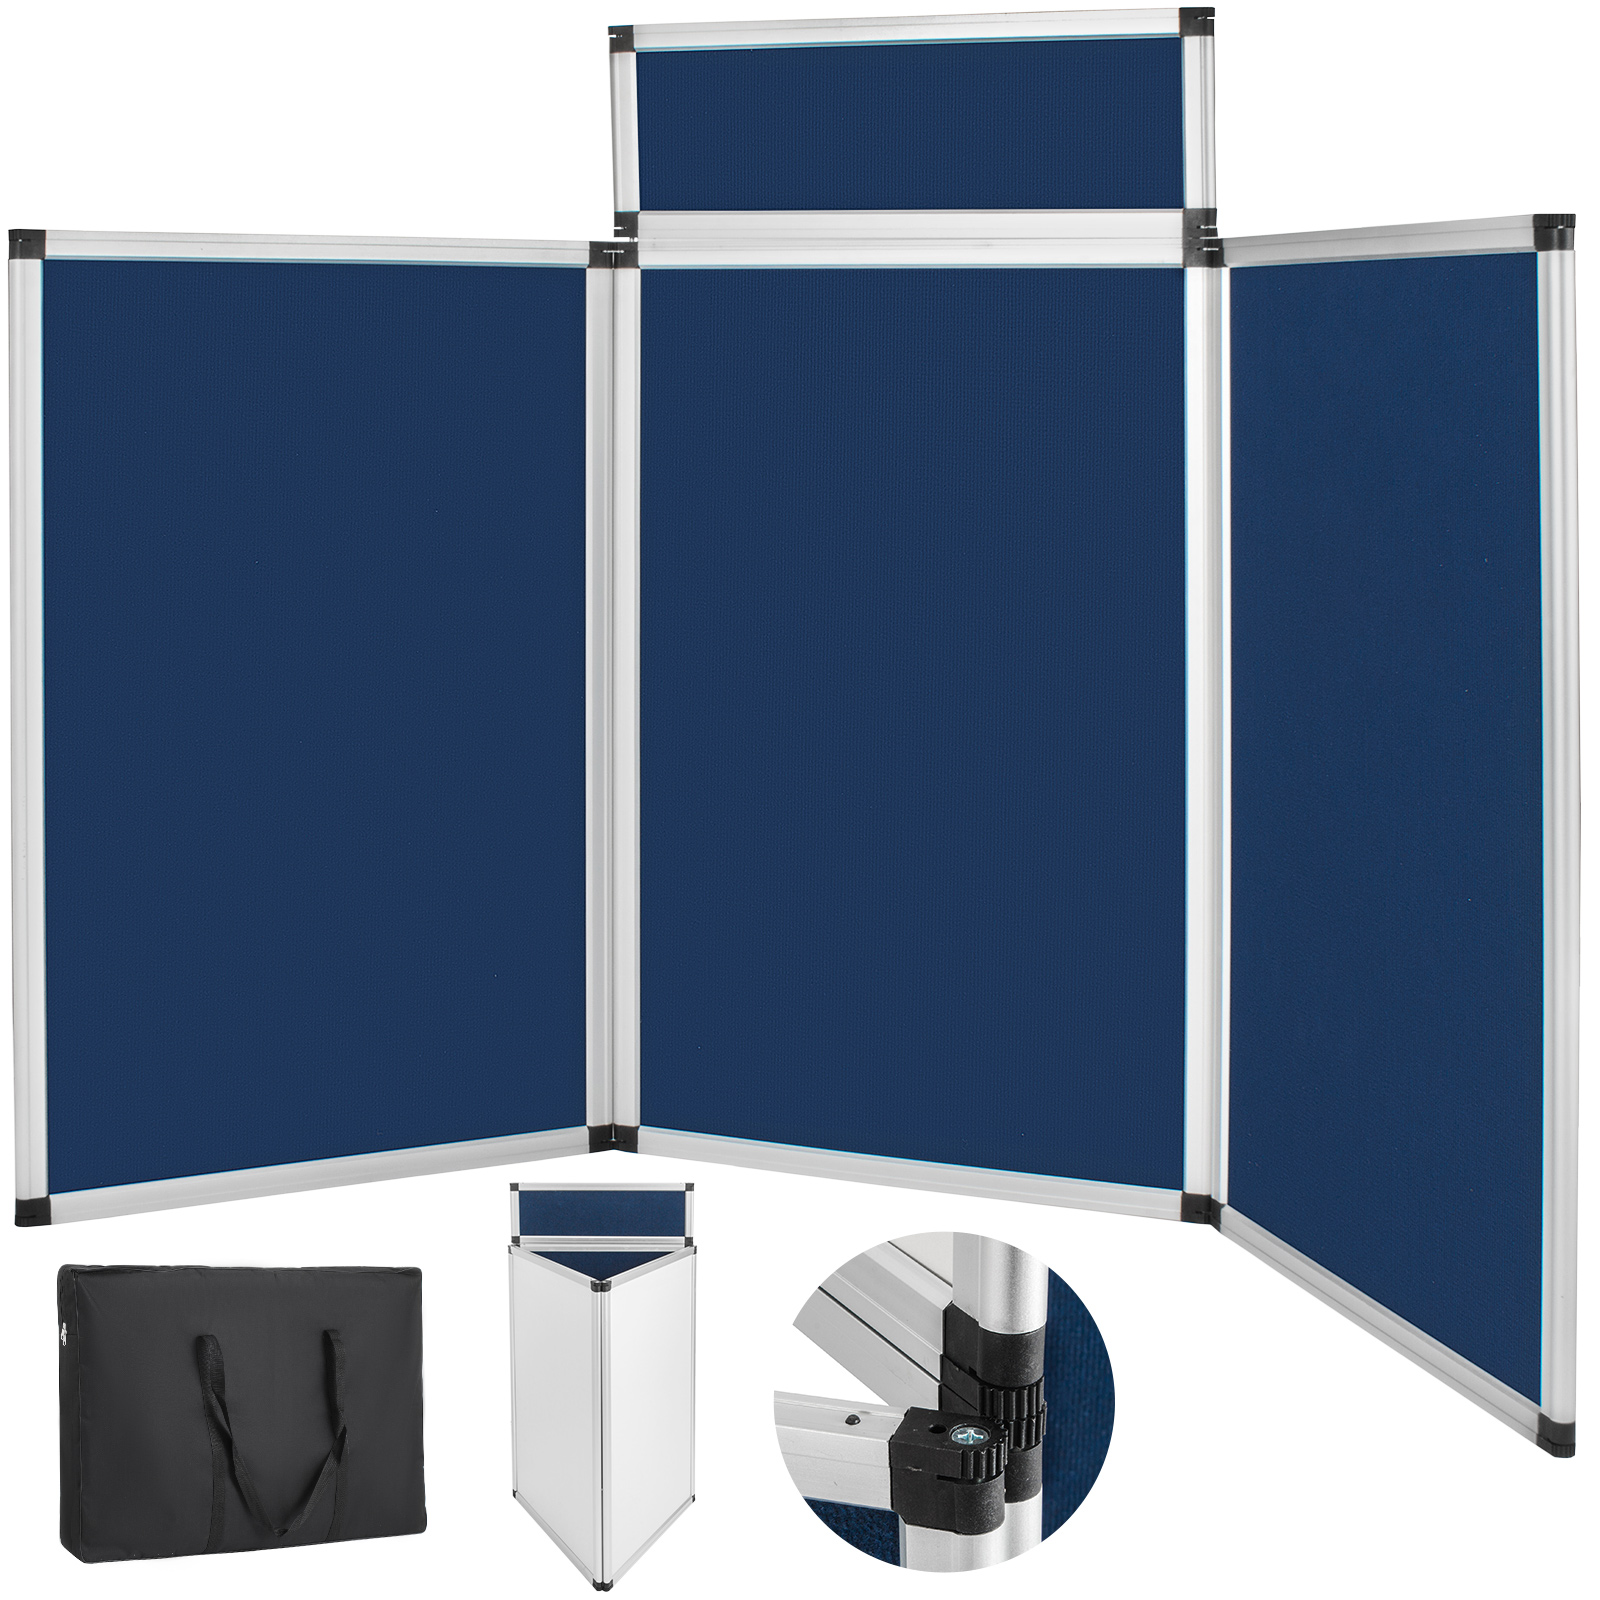 Portable Exhibition Display Boards : Folding portable display board exhibition trade show presentation